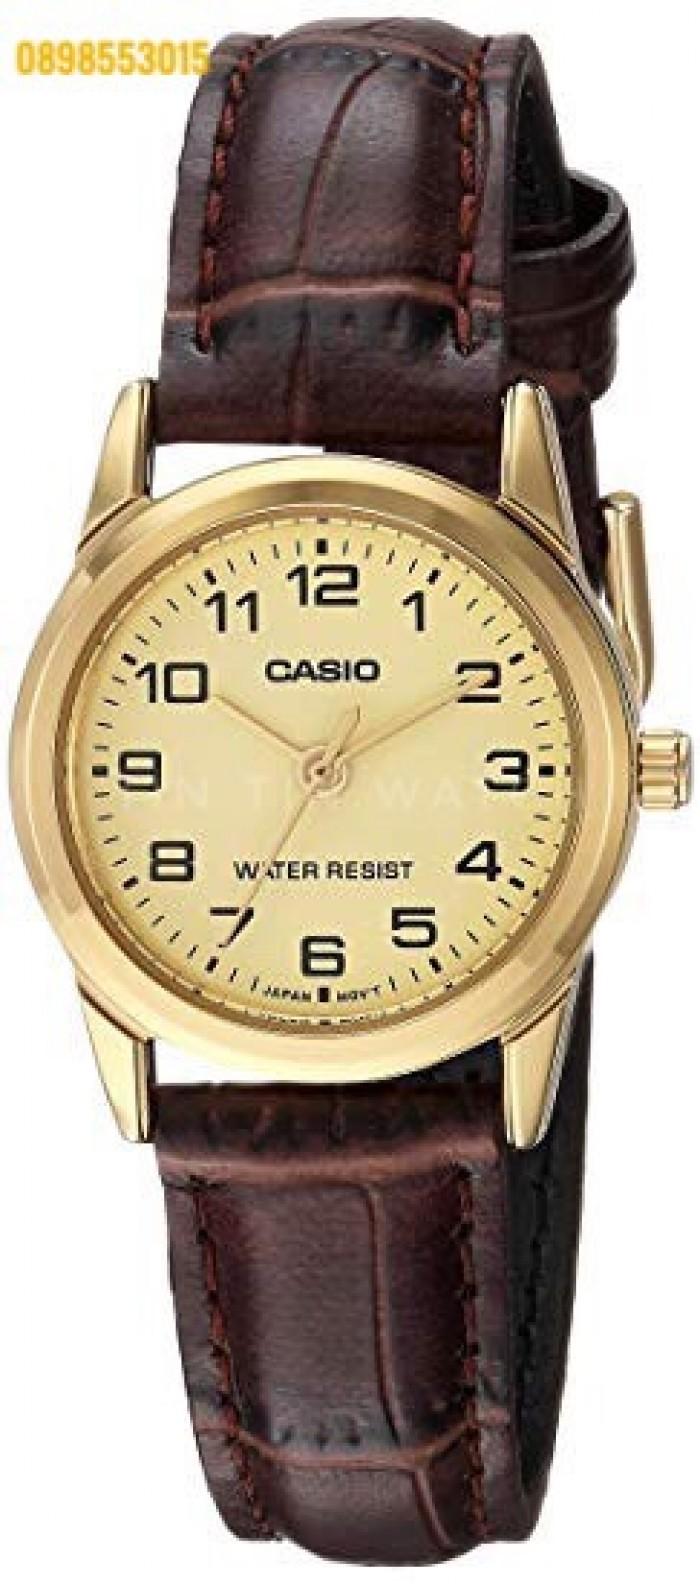 Đồng hồ nữ dây da Đồng hồCASIO LTP - V001GL - 9BUDF0